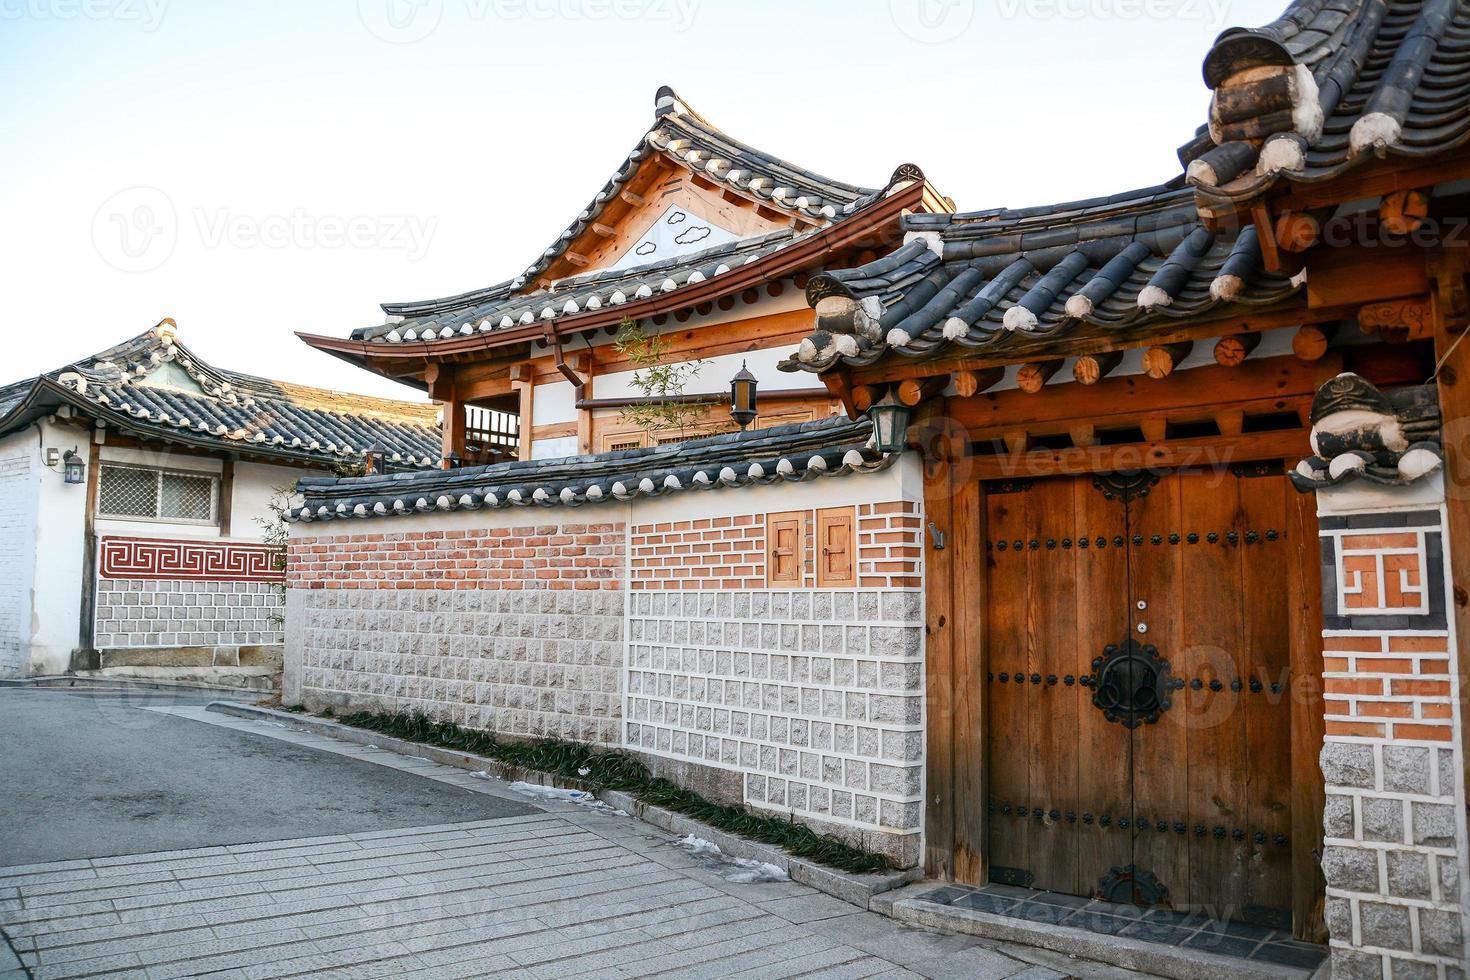 vila bukchon hanok em seoul, coreia do sul foto